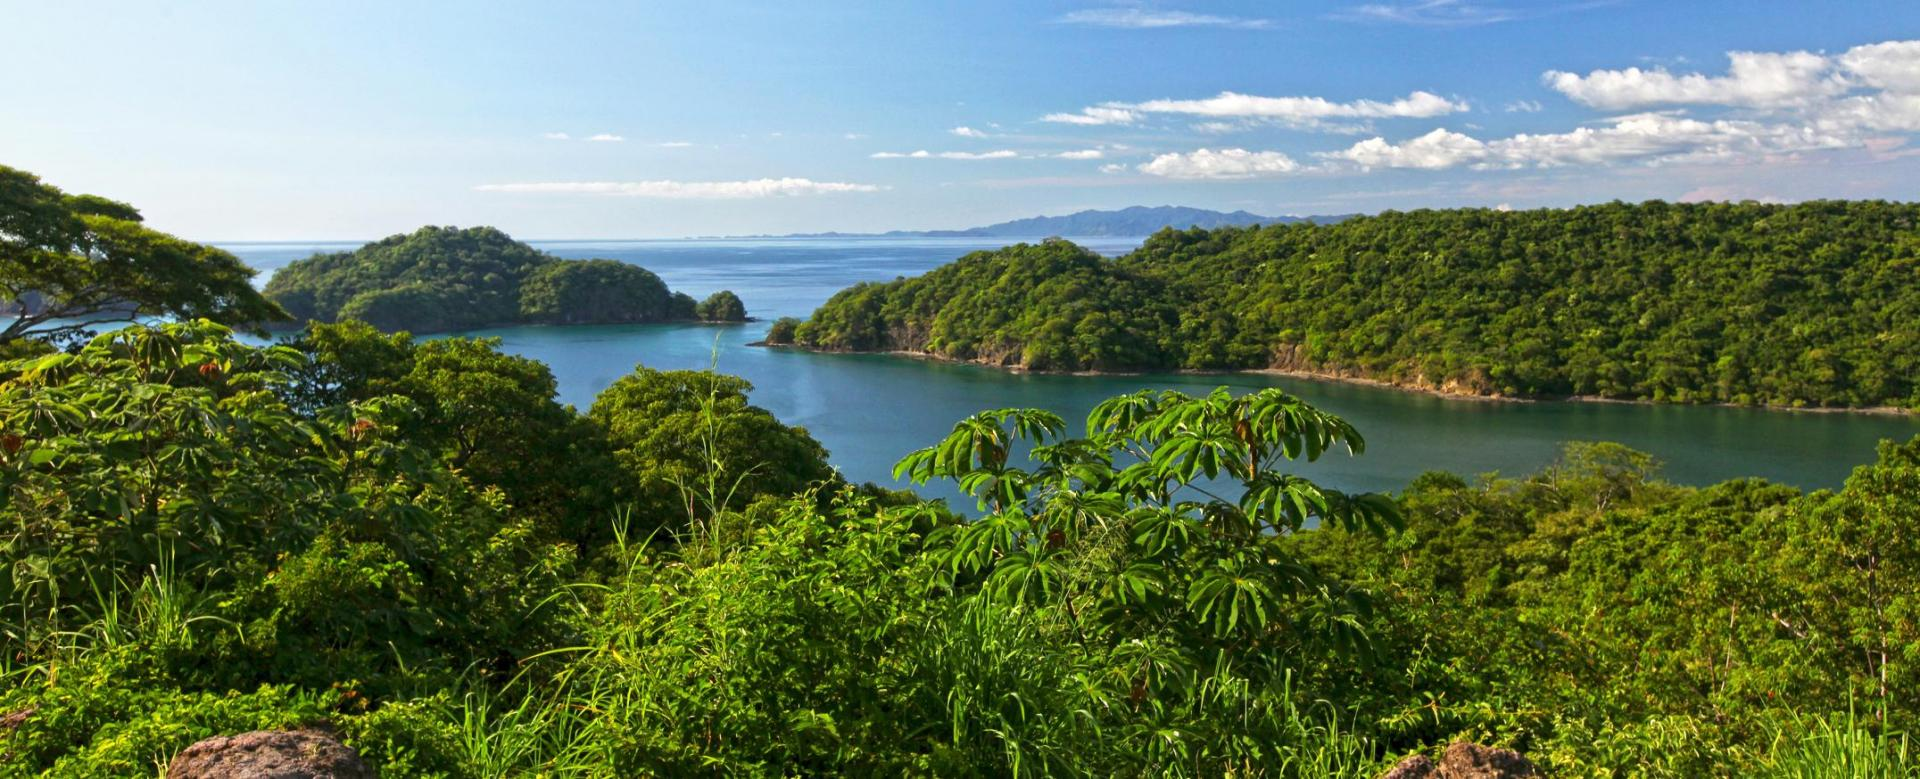 Voyage à pied : Costa Rica : Au pays du guanacaste